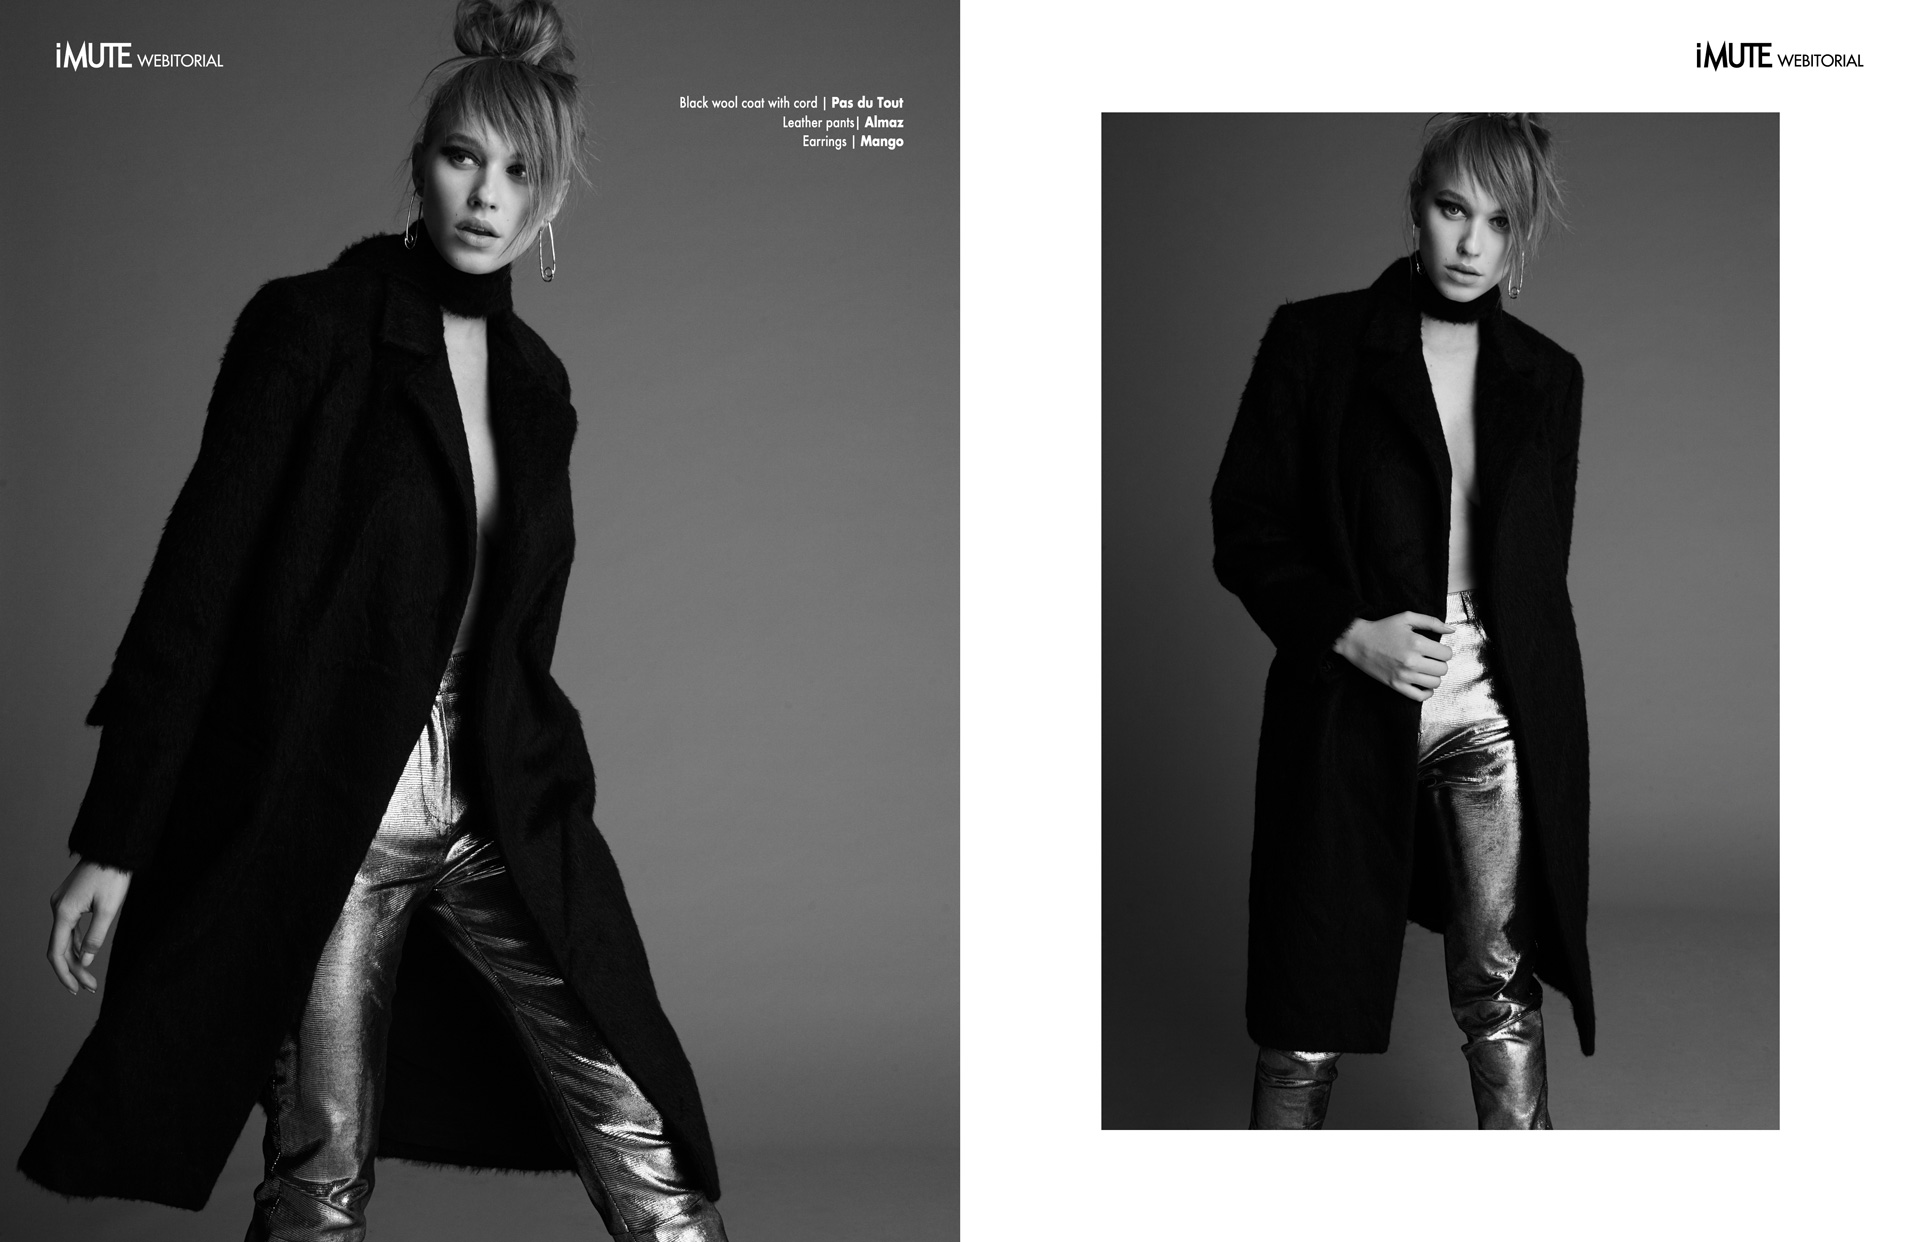 Gina webitorial for iMute Magazine Photographer | Mike Nicolaev Model | Gina Chirila @ Mandarina Models Stylist | Irina Hartia Make up | Alexandra Craescu Hair | Javier Vergara